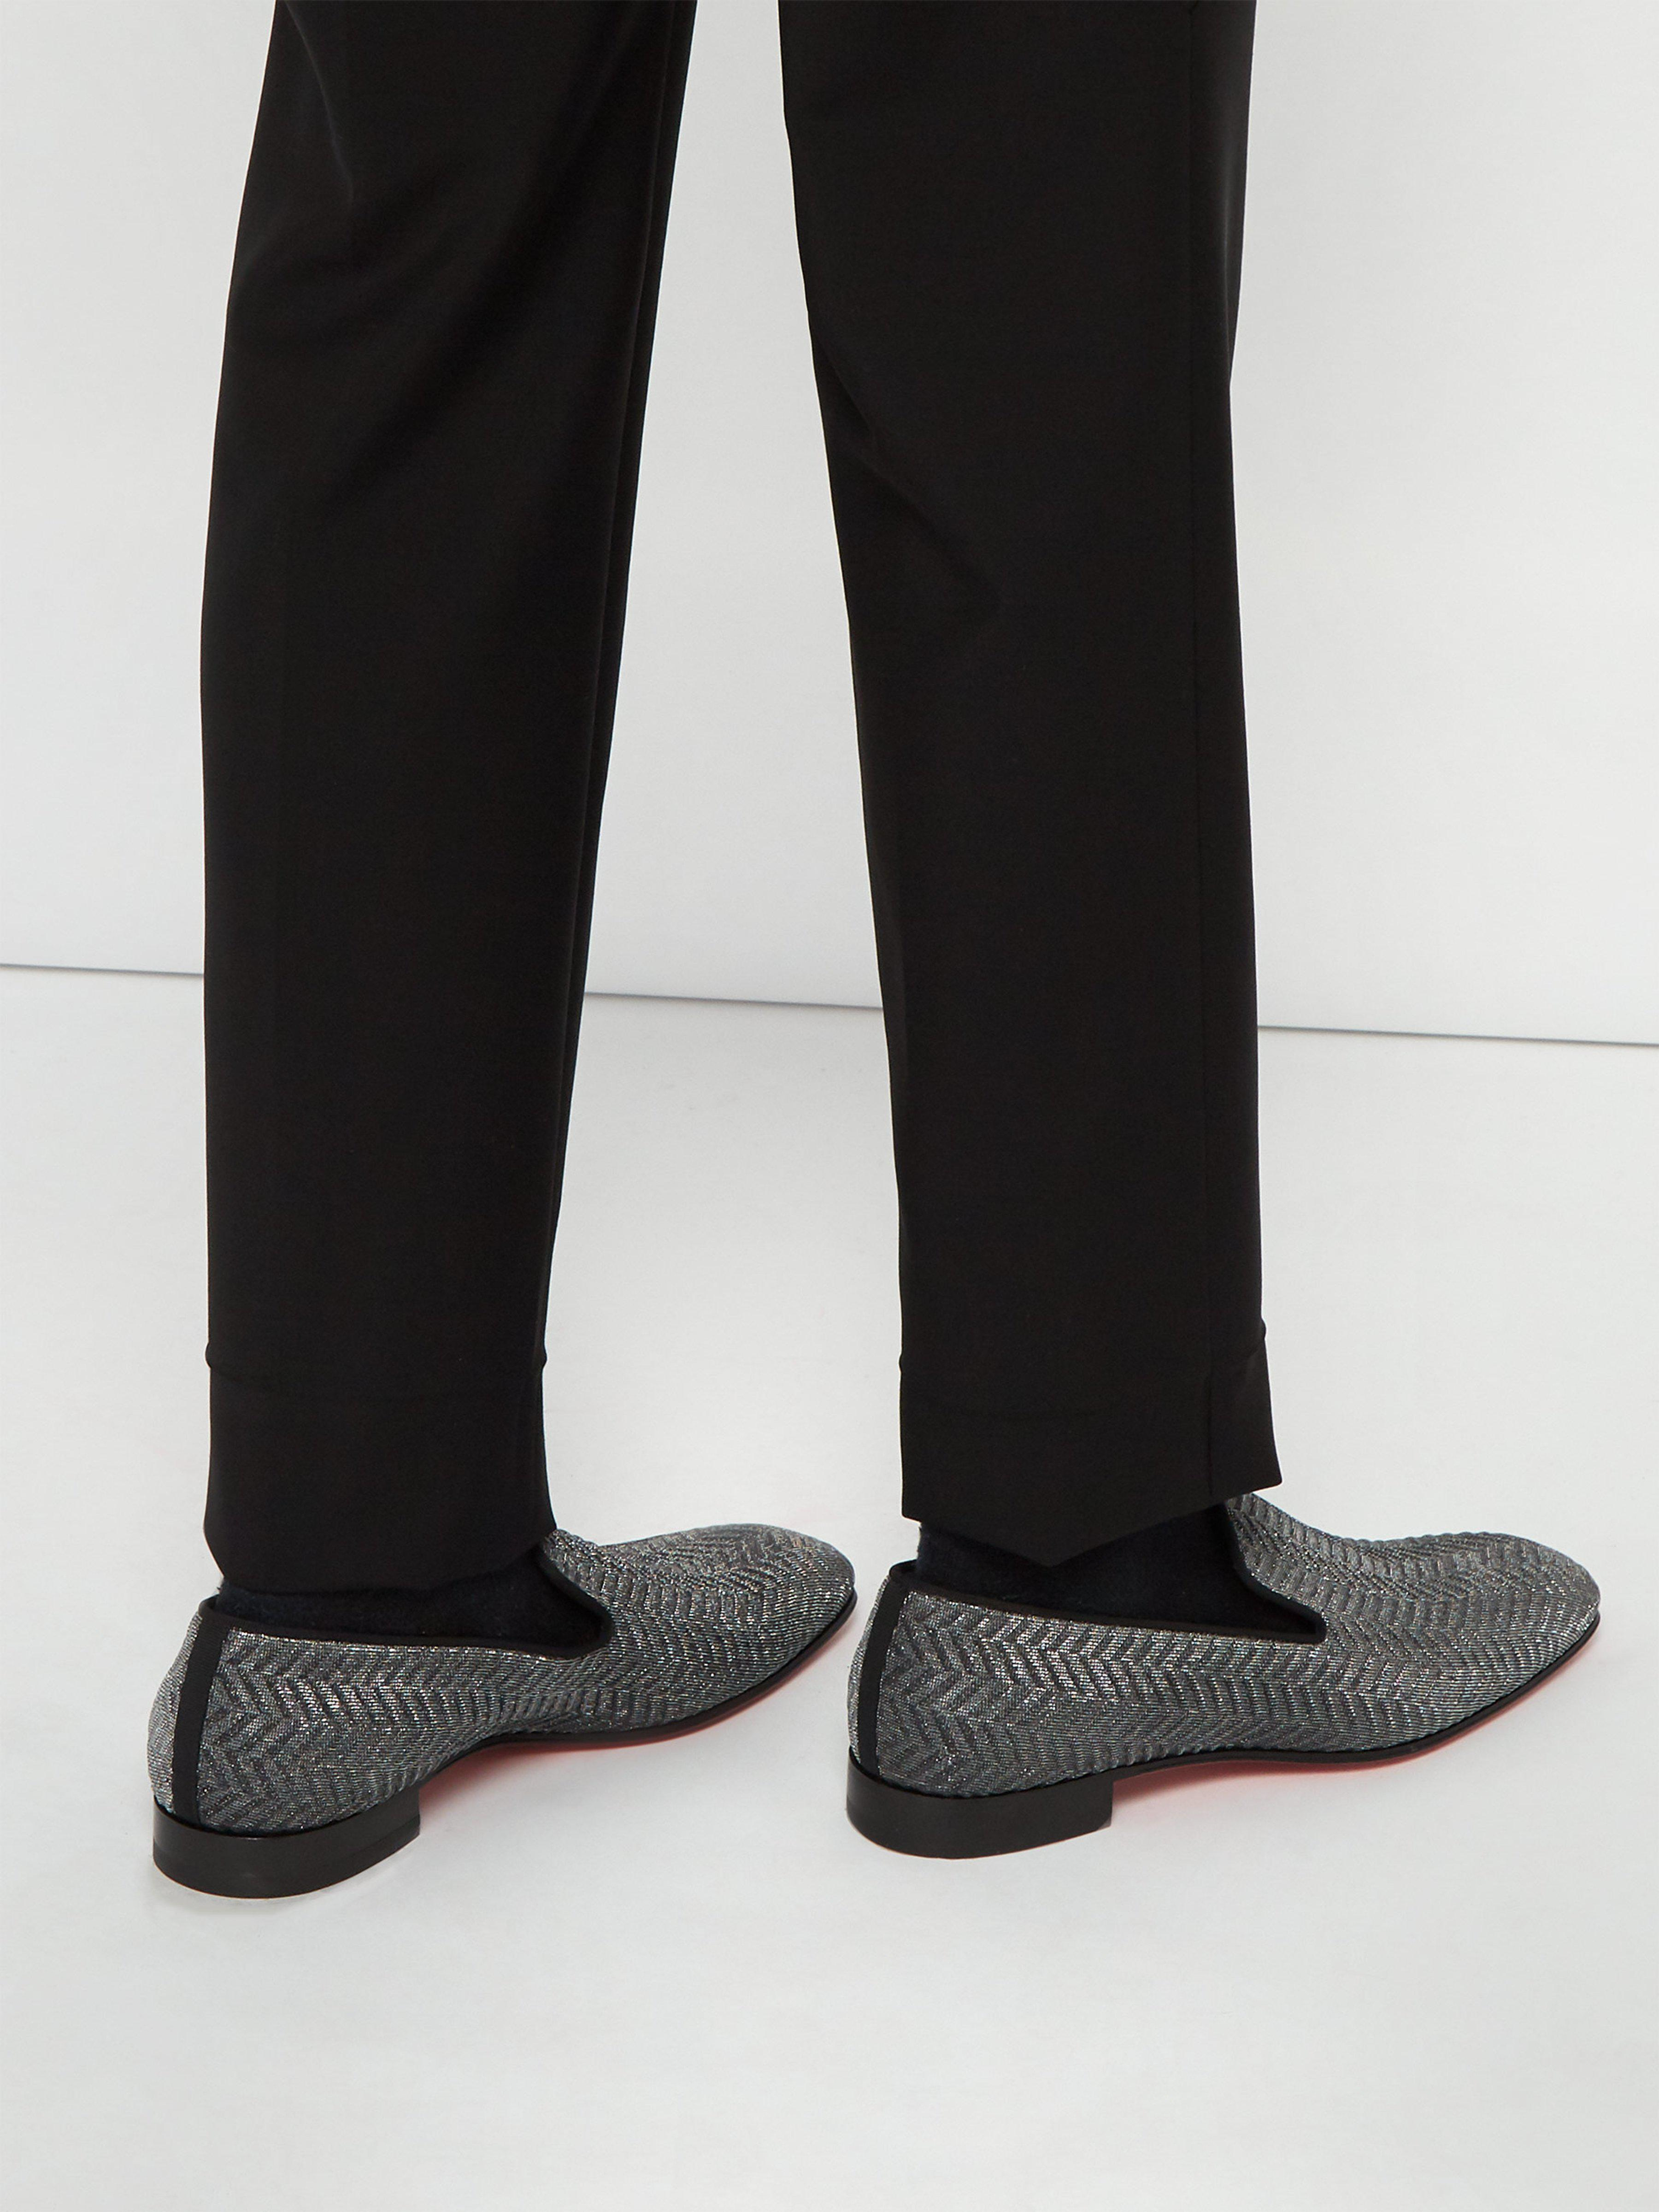 ef7fa732c3fe Christian Louboutin Dandelion Chevron Gaufre Loafers in Metallic for Men -  Lyst